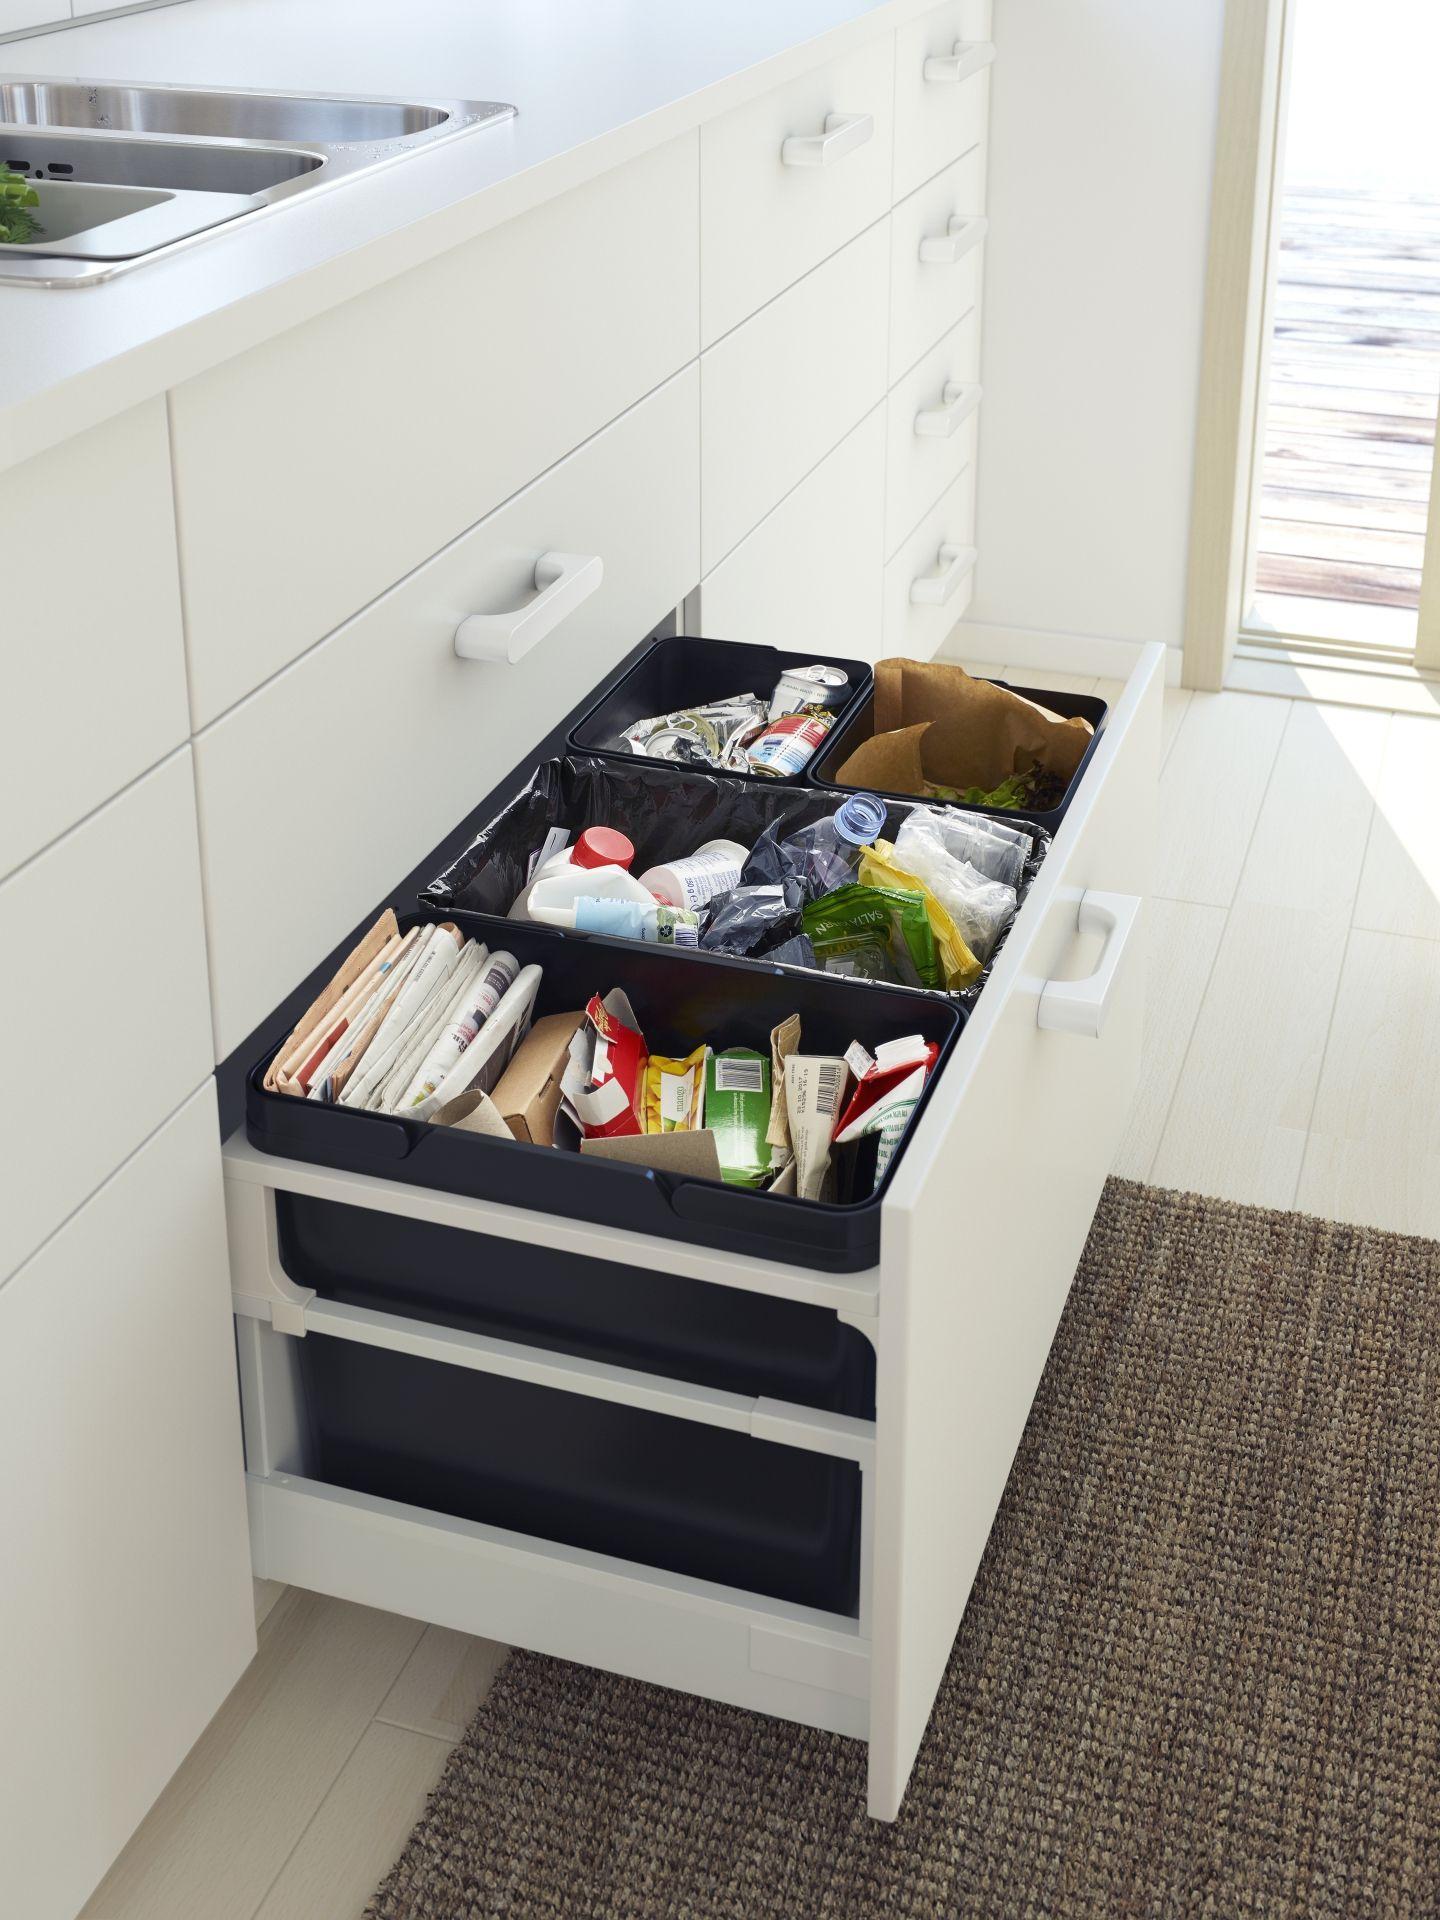 beh lter f r abfalltrennung k che ikea k che beh lter. Black Bedroom Furniture Sets. Home Design Ideas